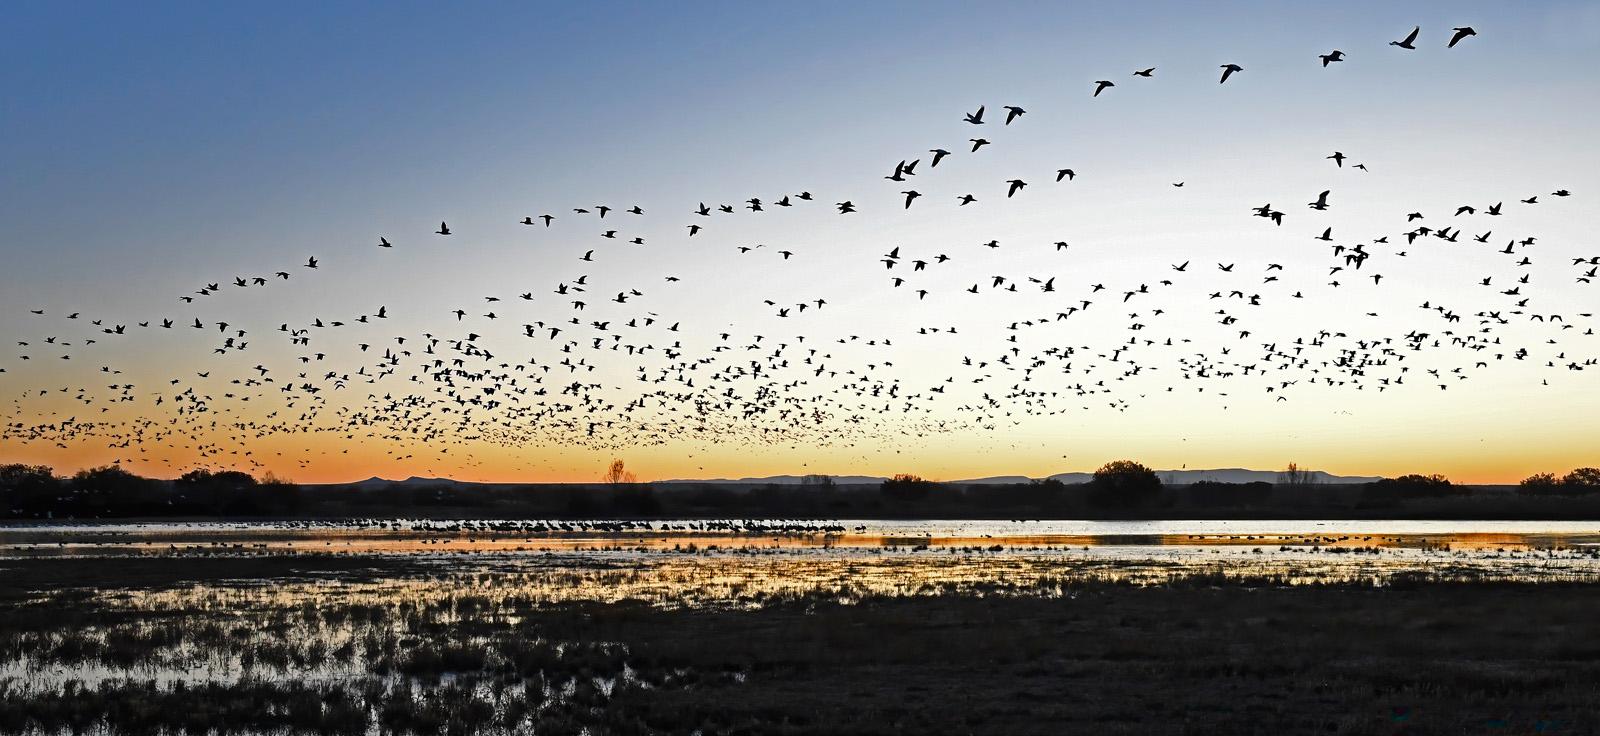 Name:  Snow-Geese-at-Sunrise-R---Bosque-del-Apache-111319-midi1600.jpg Views: 86 Size:  364.7 KB